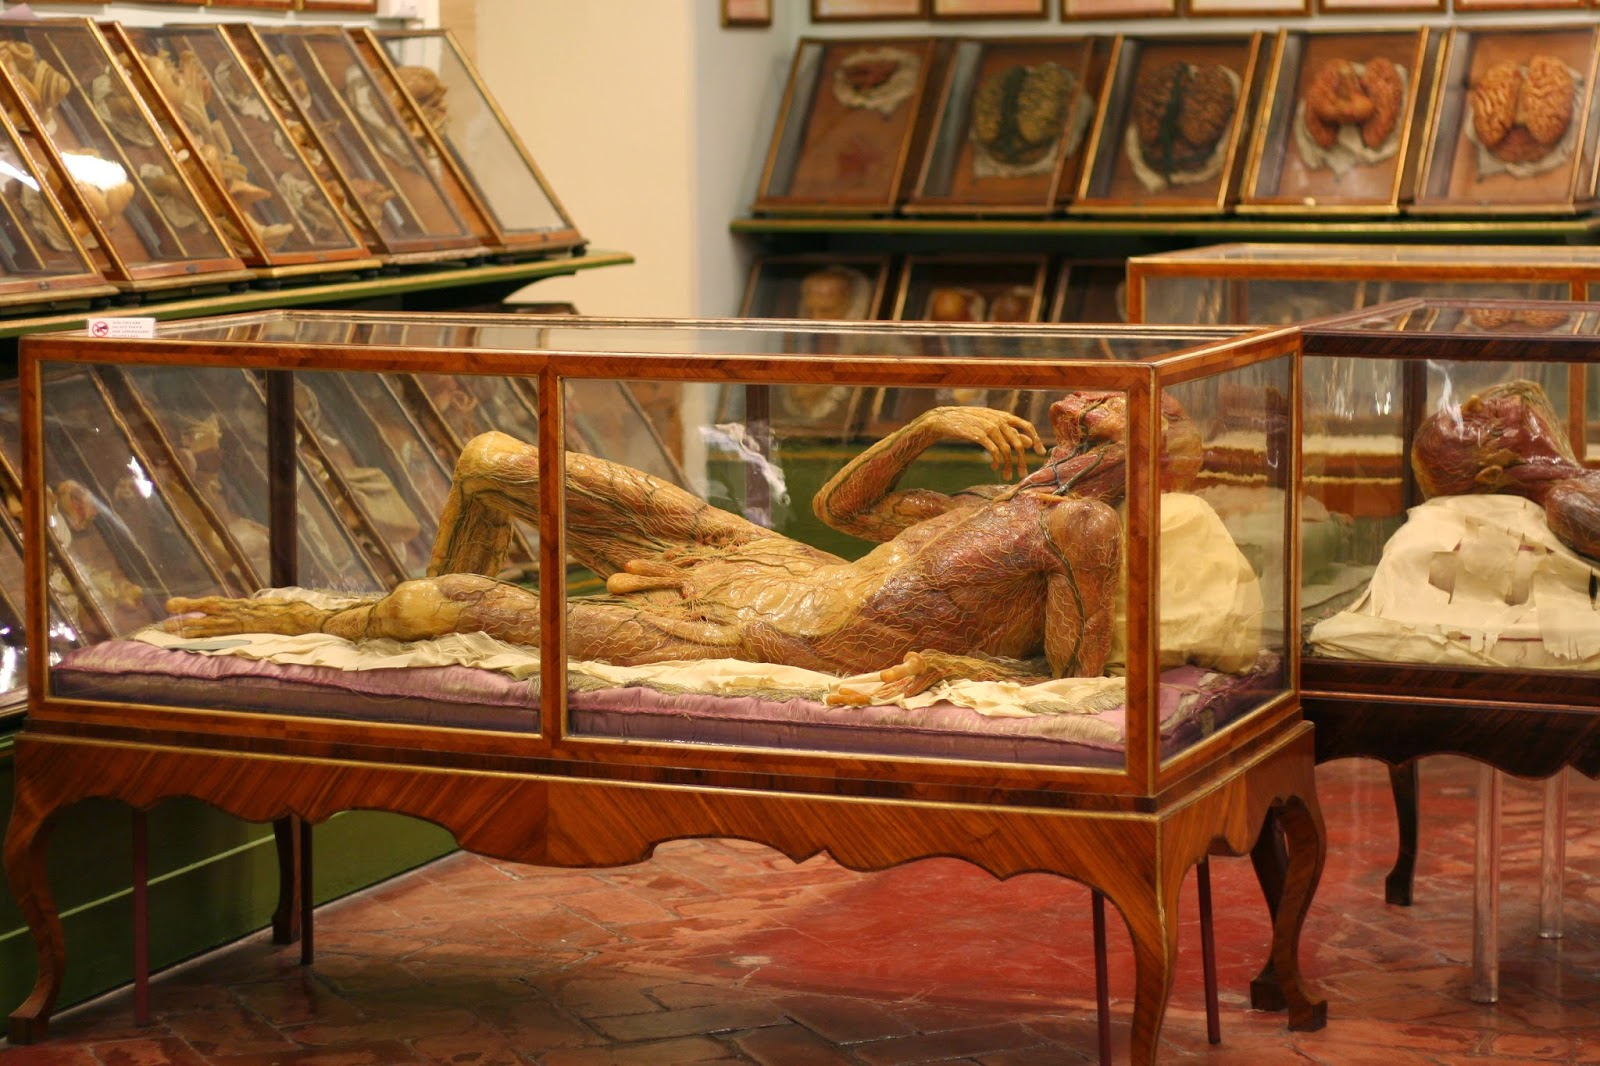 The 19TH CENTURY ANATOMY MUSEUM with Verity Darke | London Pop-Up ...